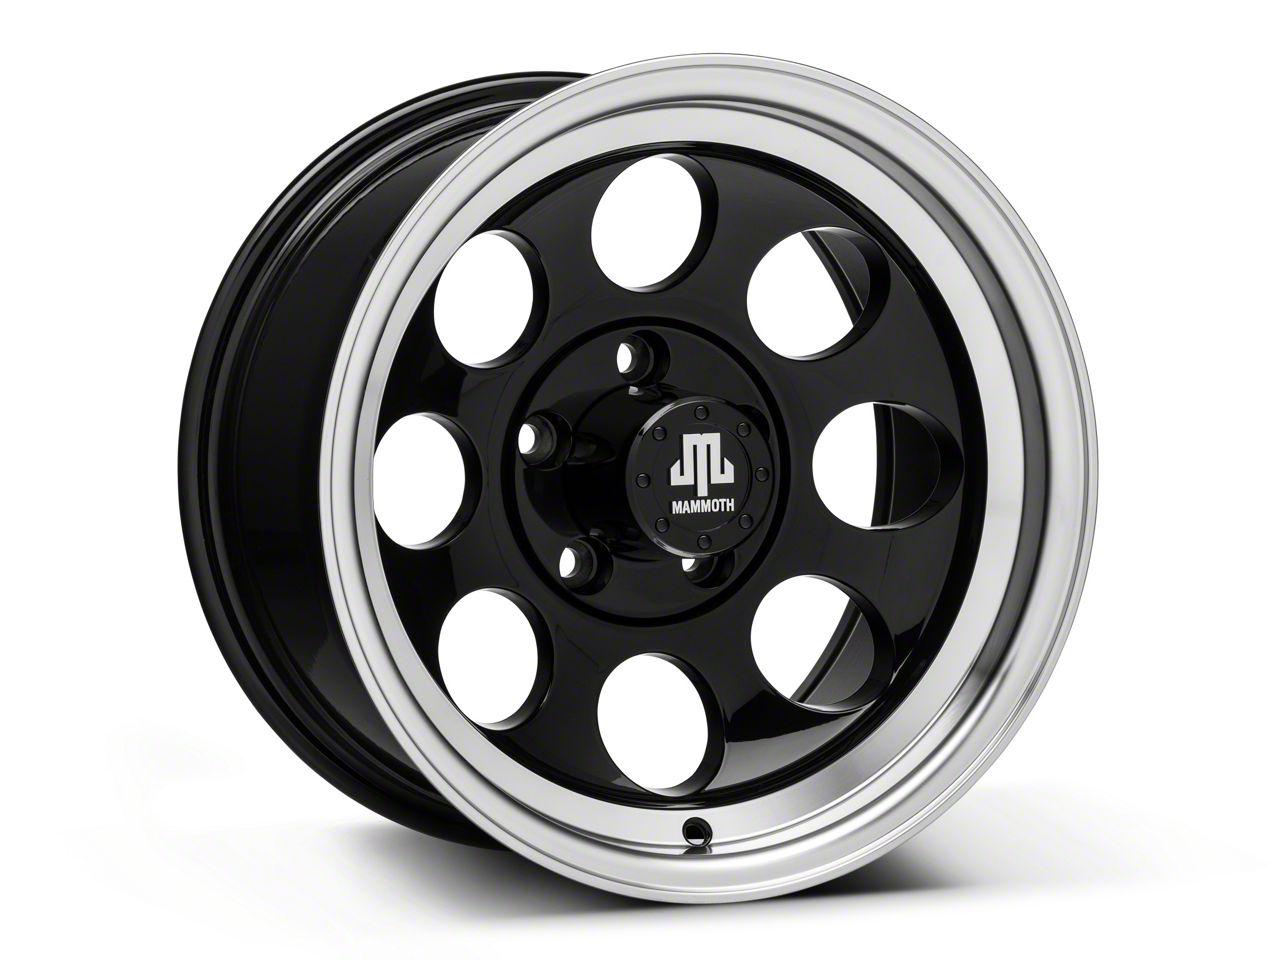 Mammoth 8 Black 15x8 Wheel & Mickey Thompson Deegan 38 31x10.50R15 Tire Kit (87-06 Jeep Wrangler YJ & TJ)